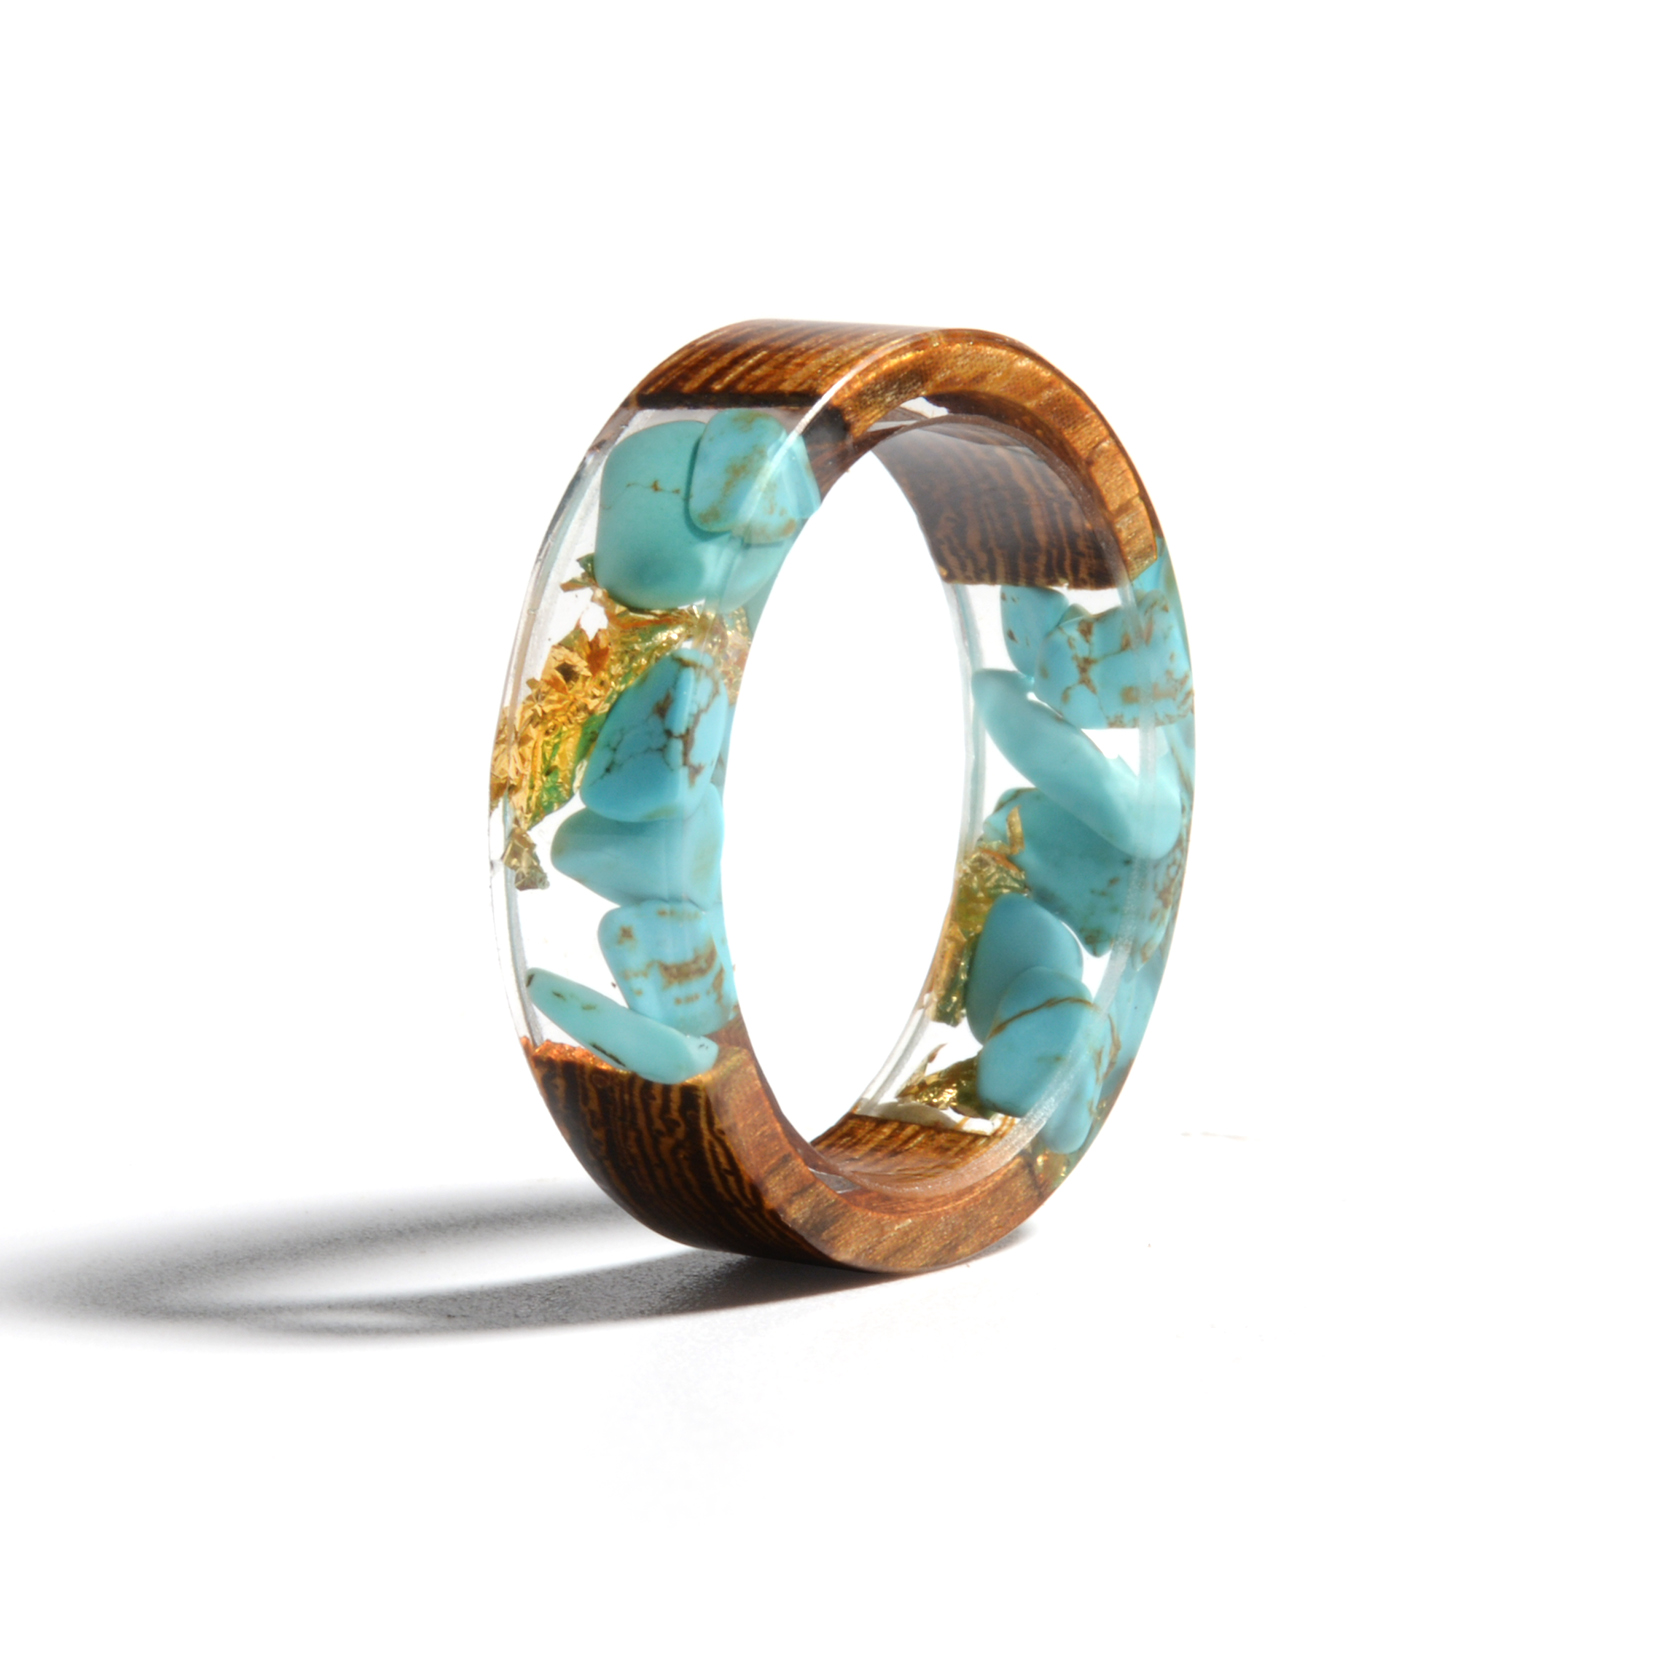 Clear Wood Resin Ring Handmade Dried Flower Hand Jewellery 17